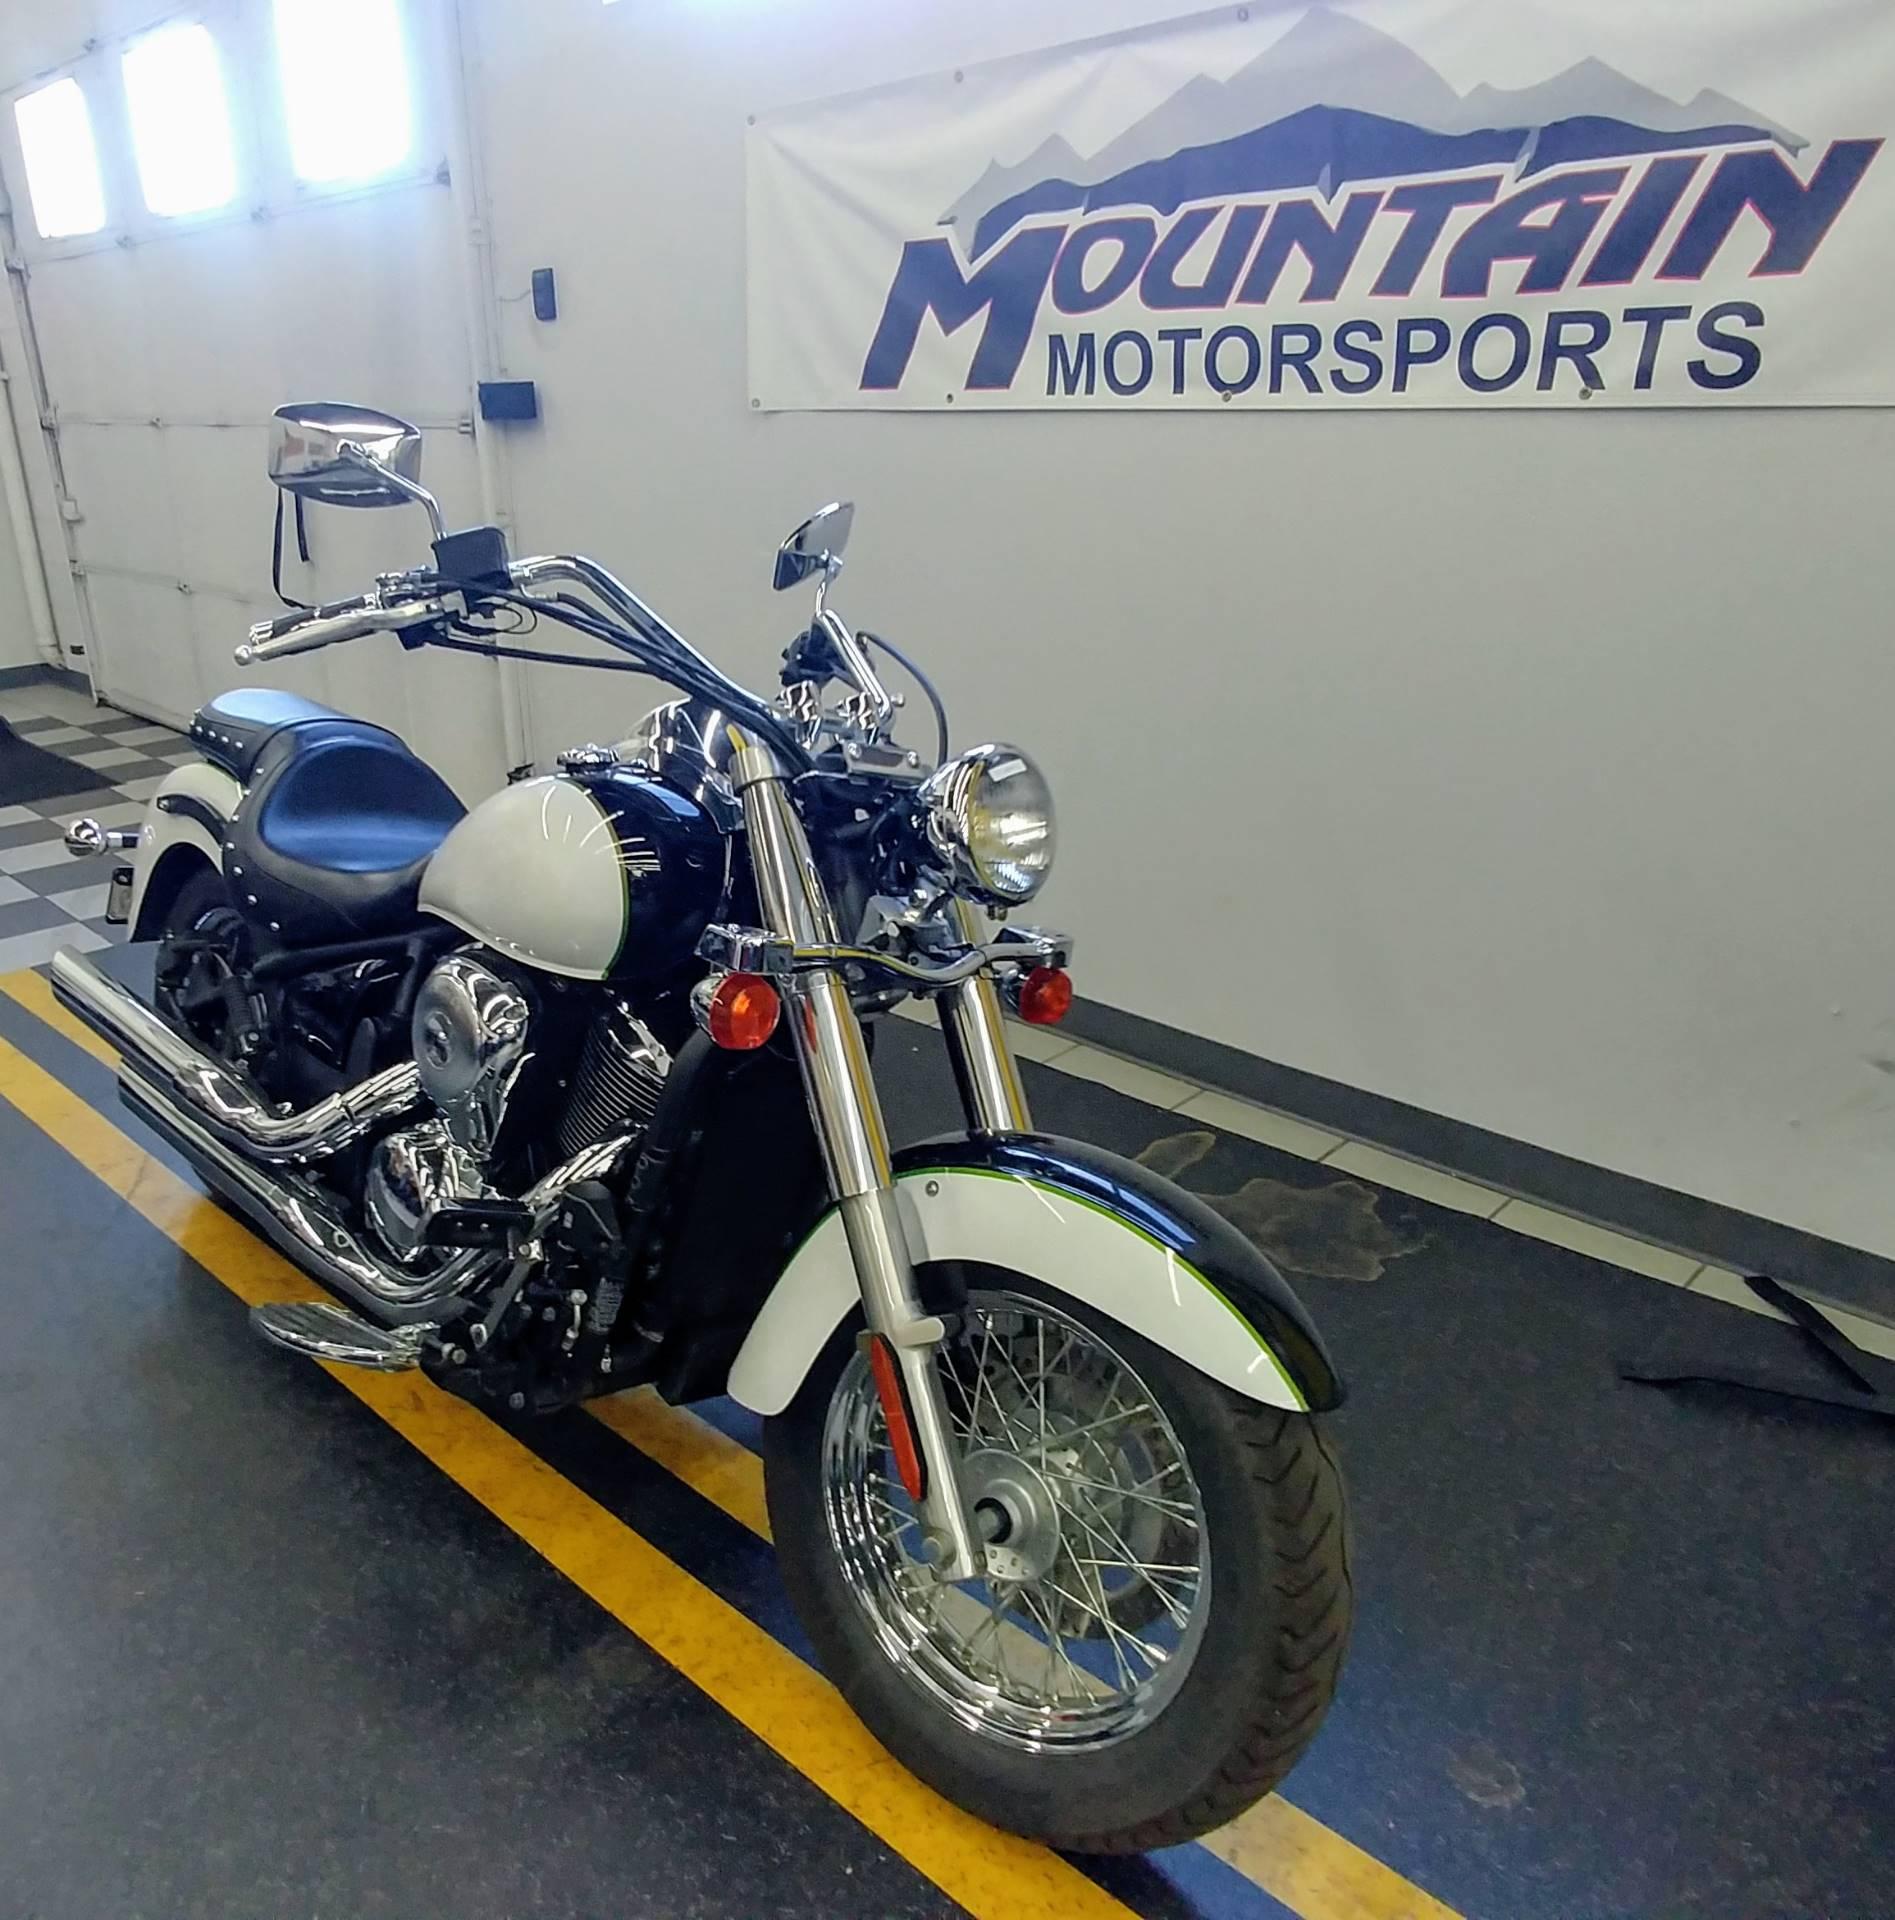 Used 2015 Kawasaki Vulcan 900 Classic Lt Motorcycles In Ontario